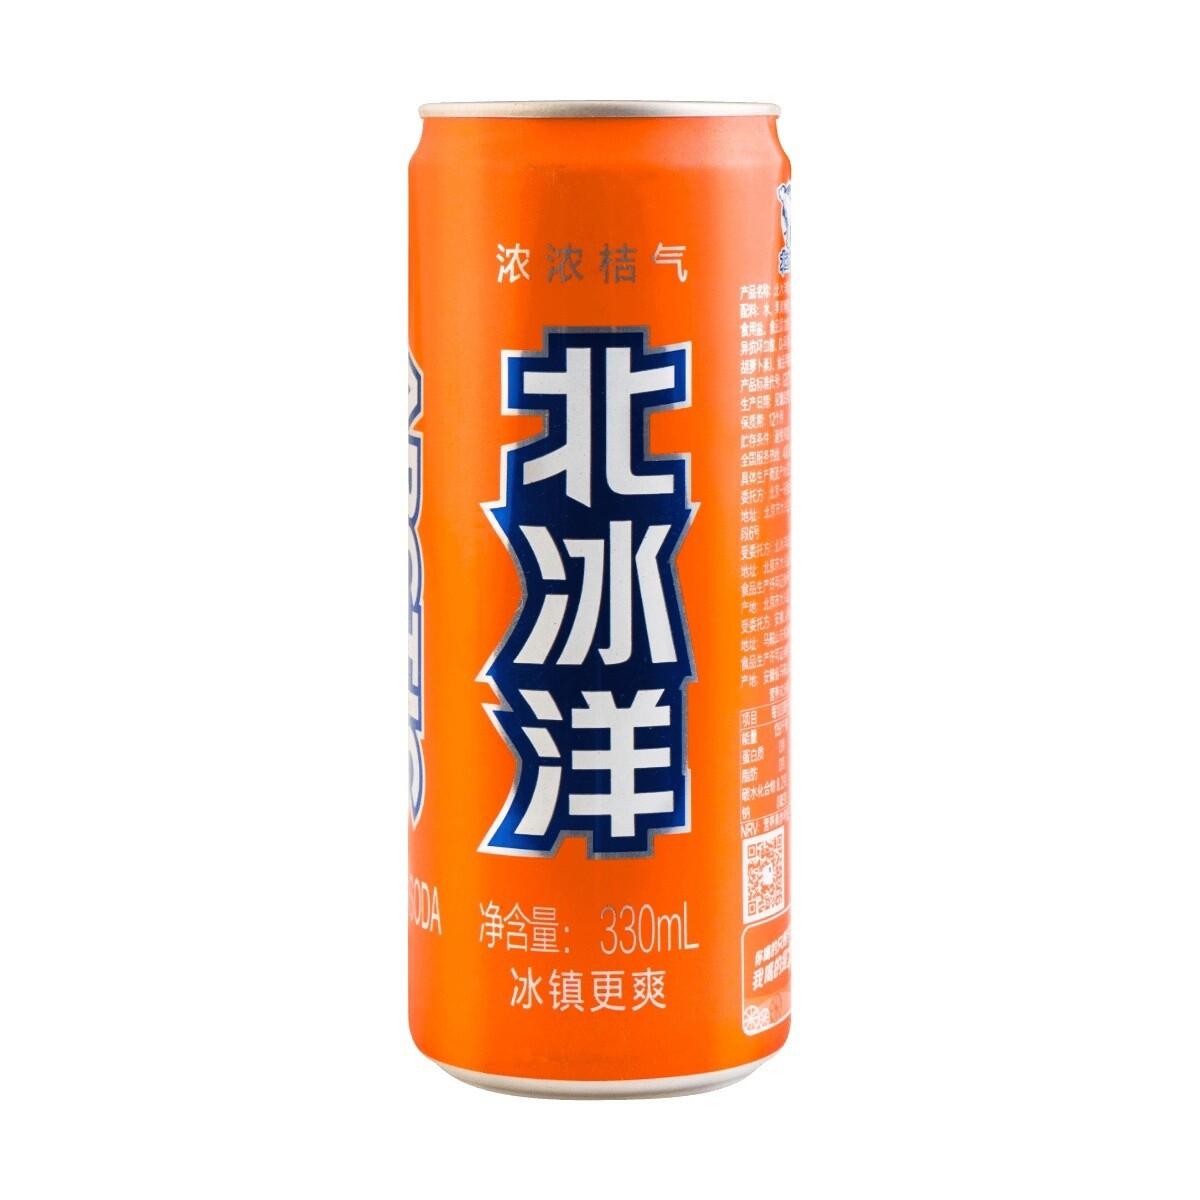 Ocean Artic Fizzy Drink Mandarin Orange  330ml